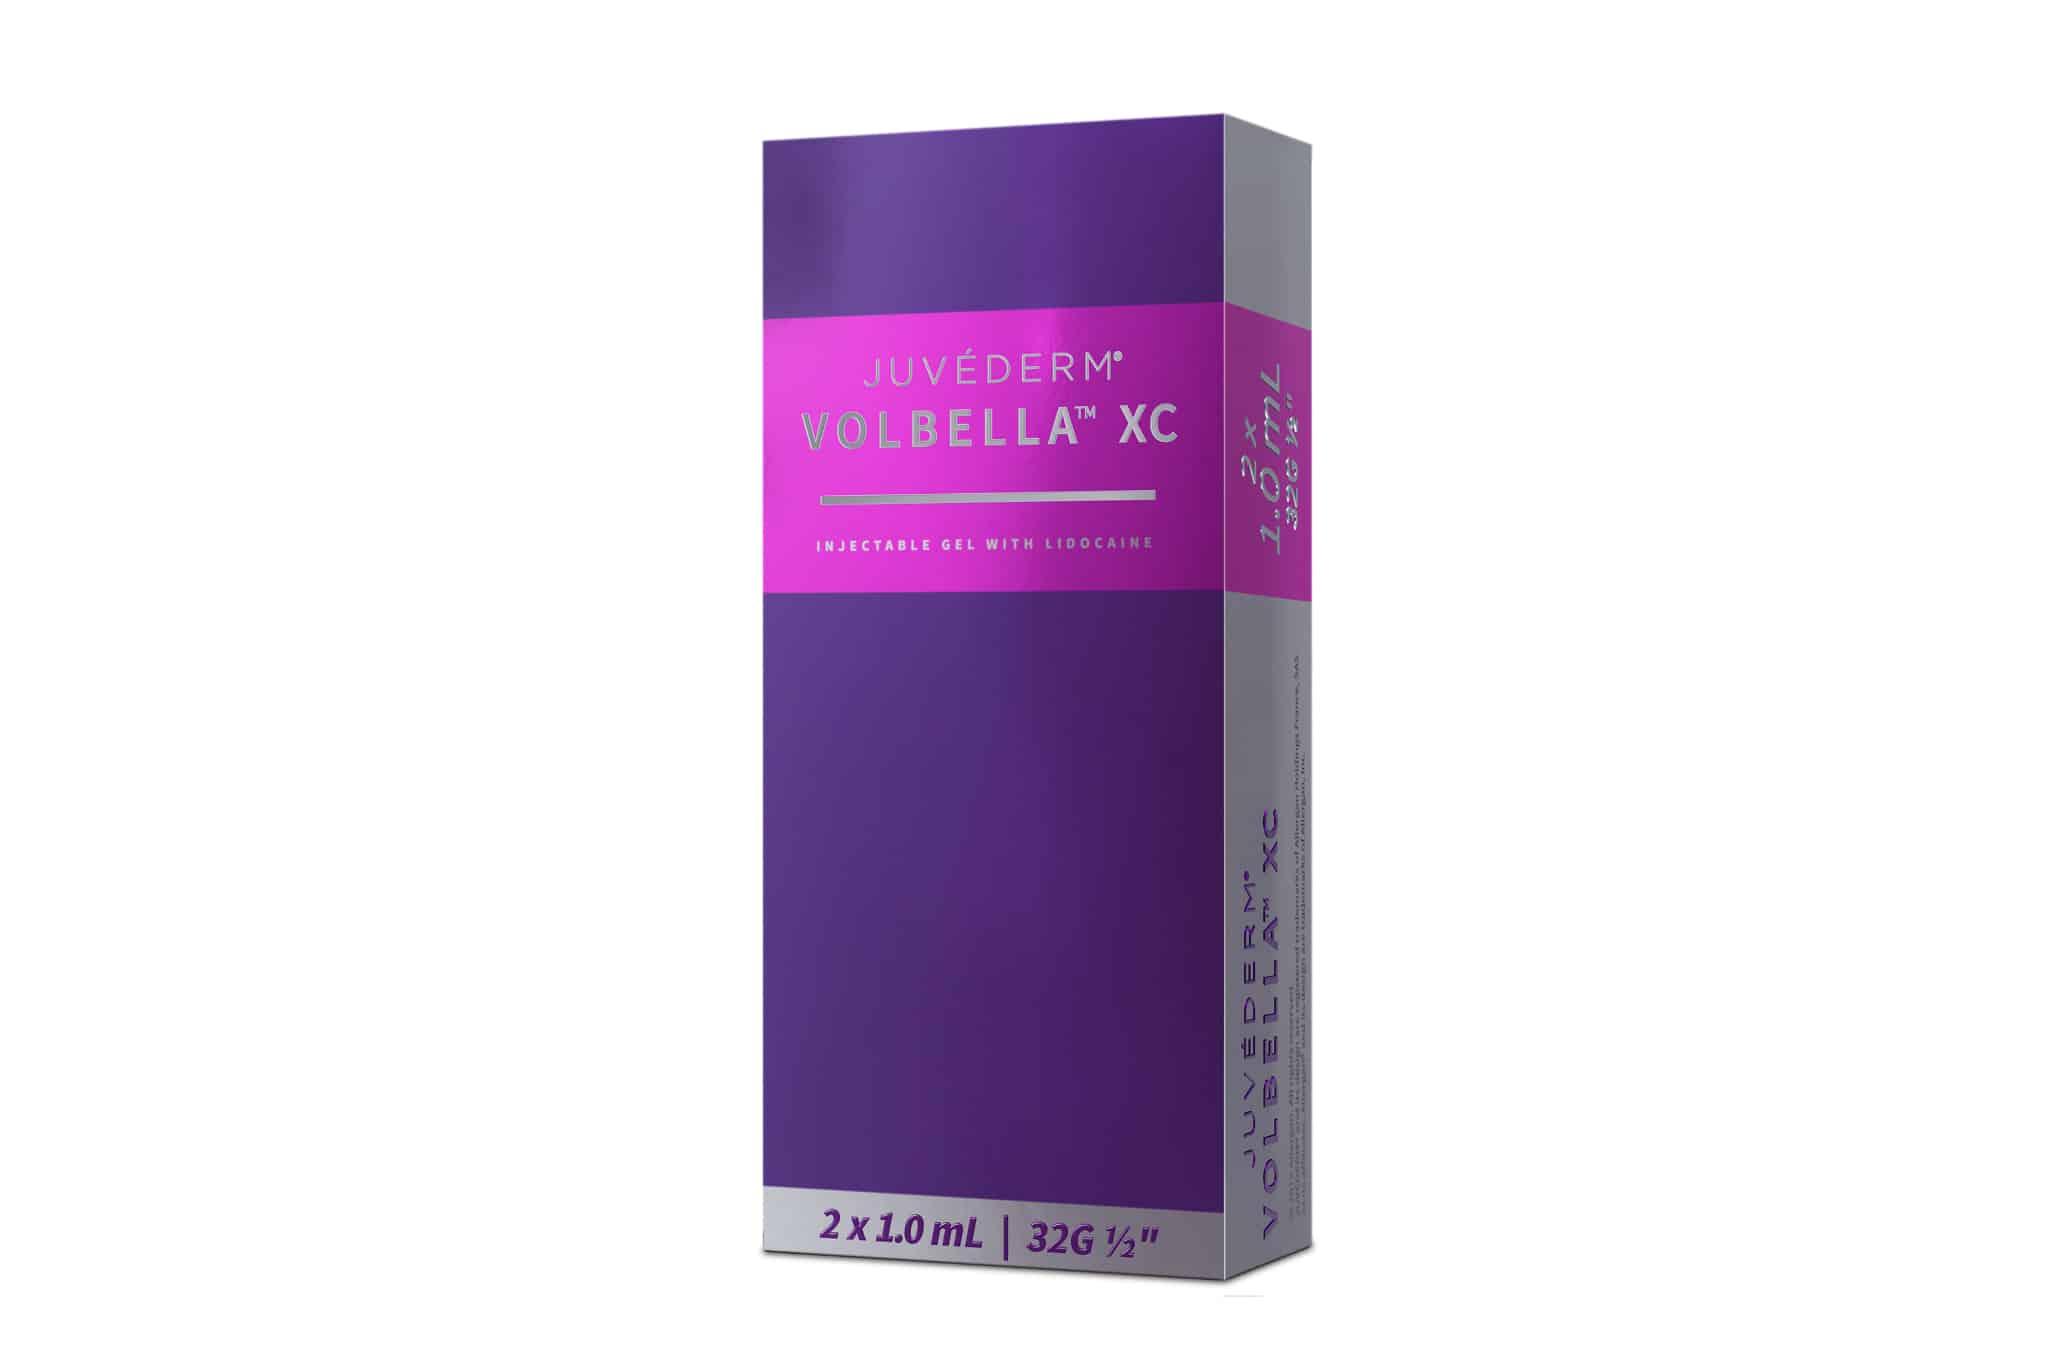 Juvederm Vobella Xc Packaging Updated